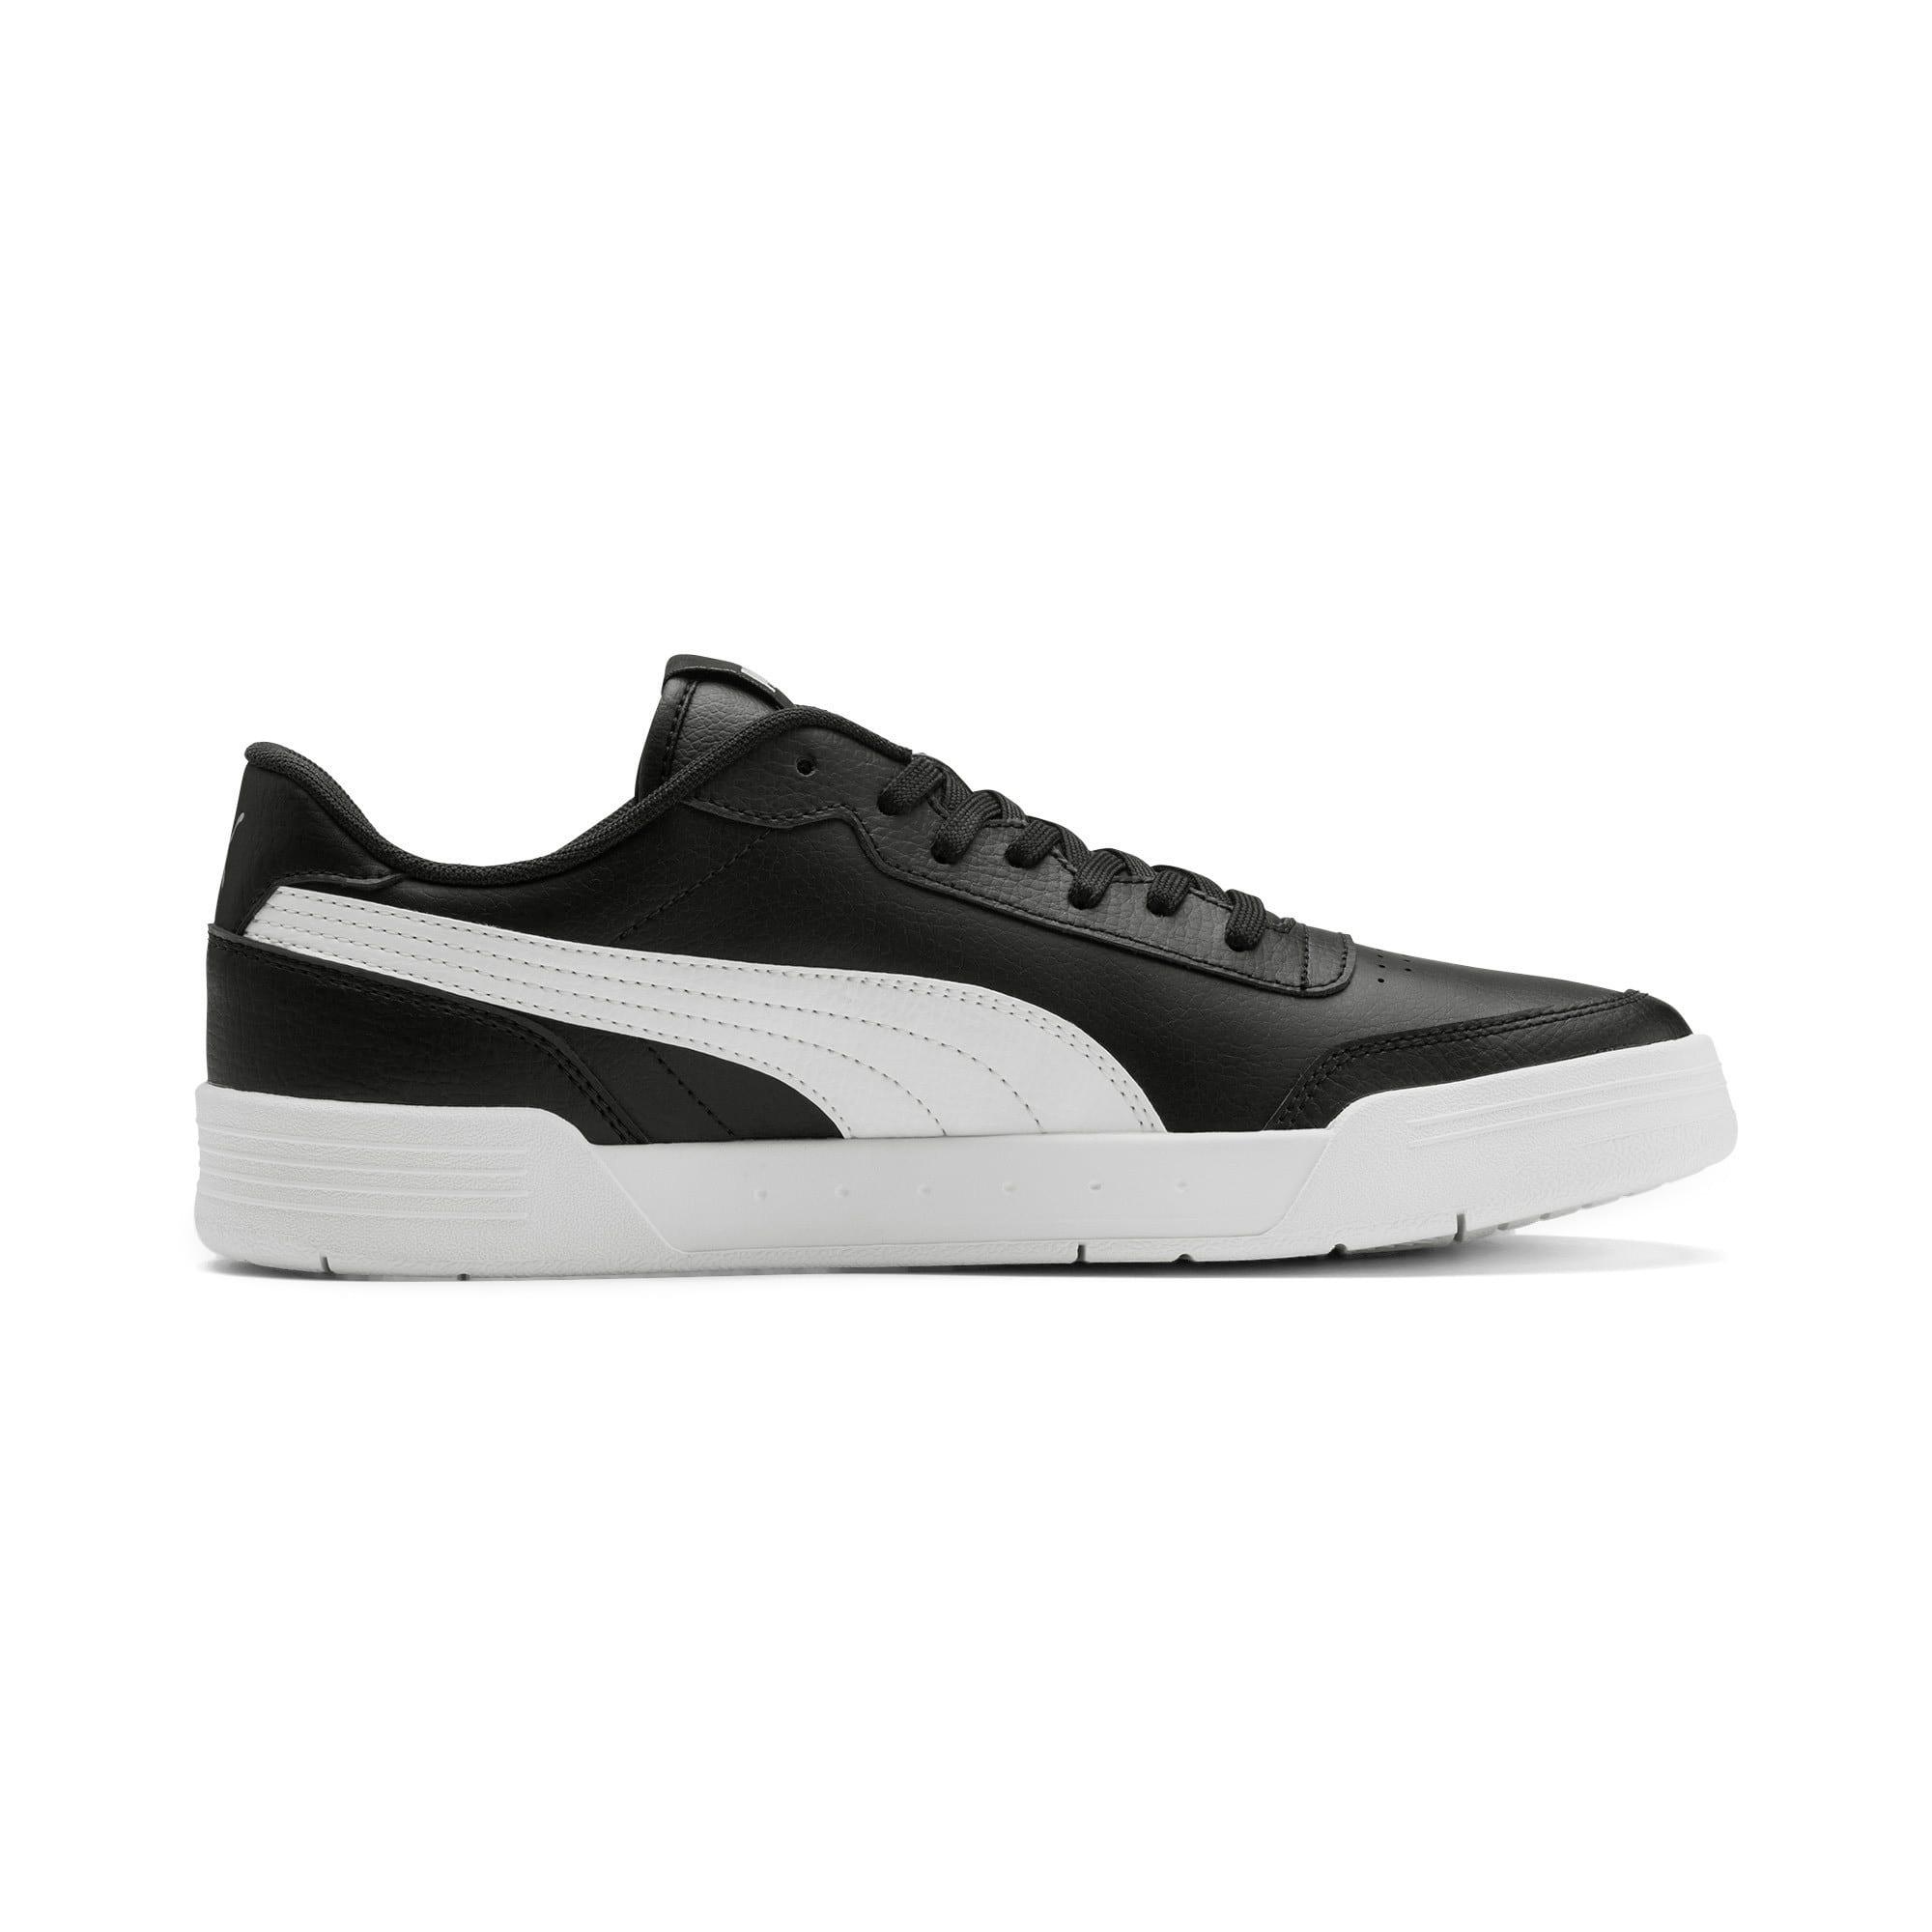 Thumbnail 6 of Caracal Sneakers, Puma Black-Puma White, medium